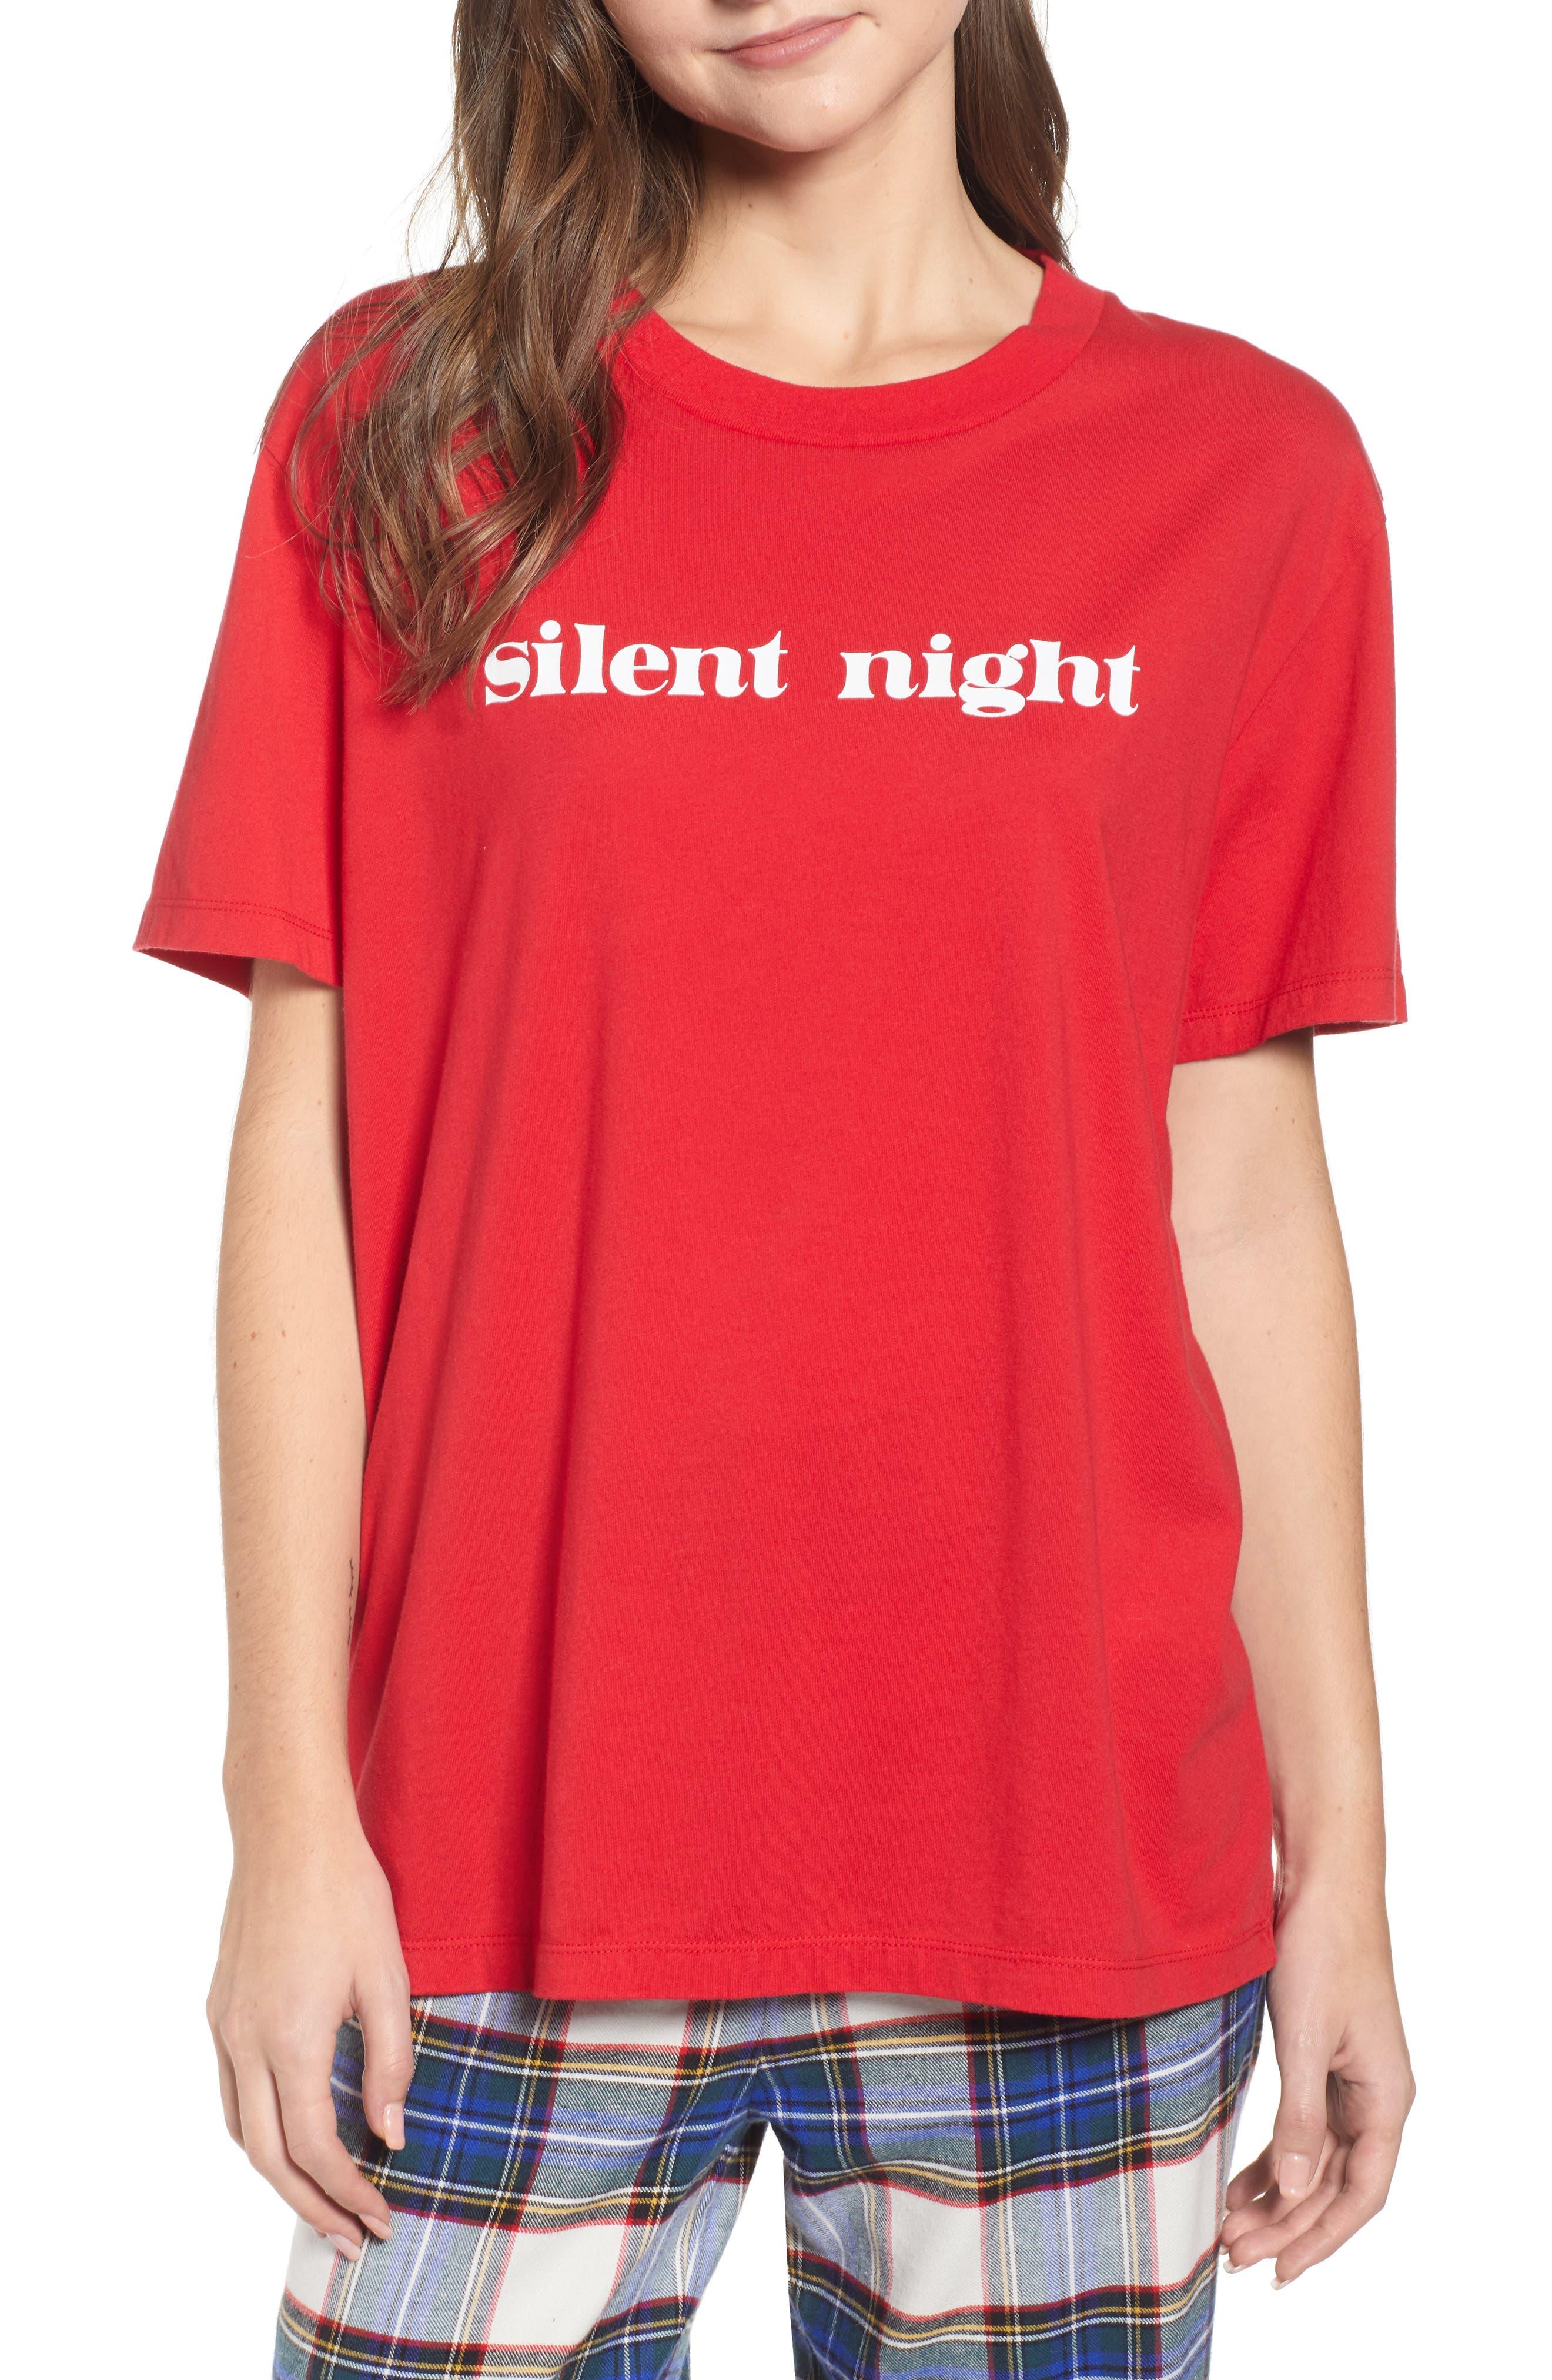 SLEEPY JONES,                             Silent Night Tee,                             Main thumbnail 1, color,                             RED